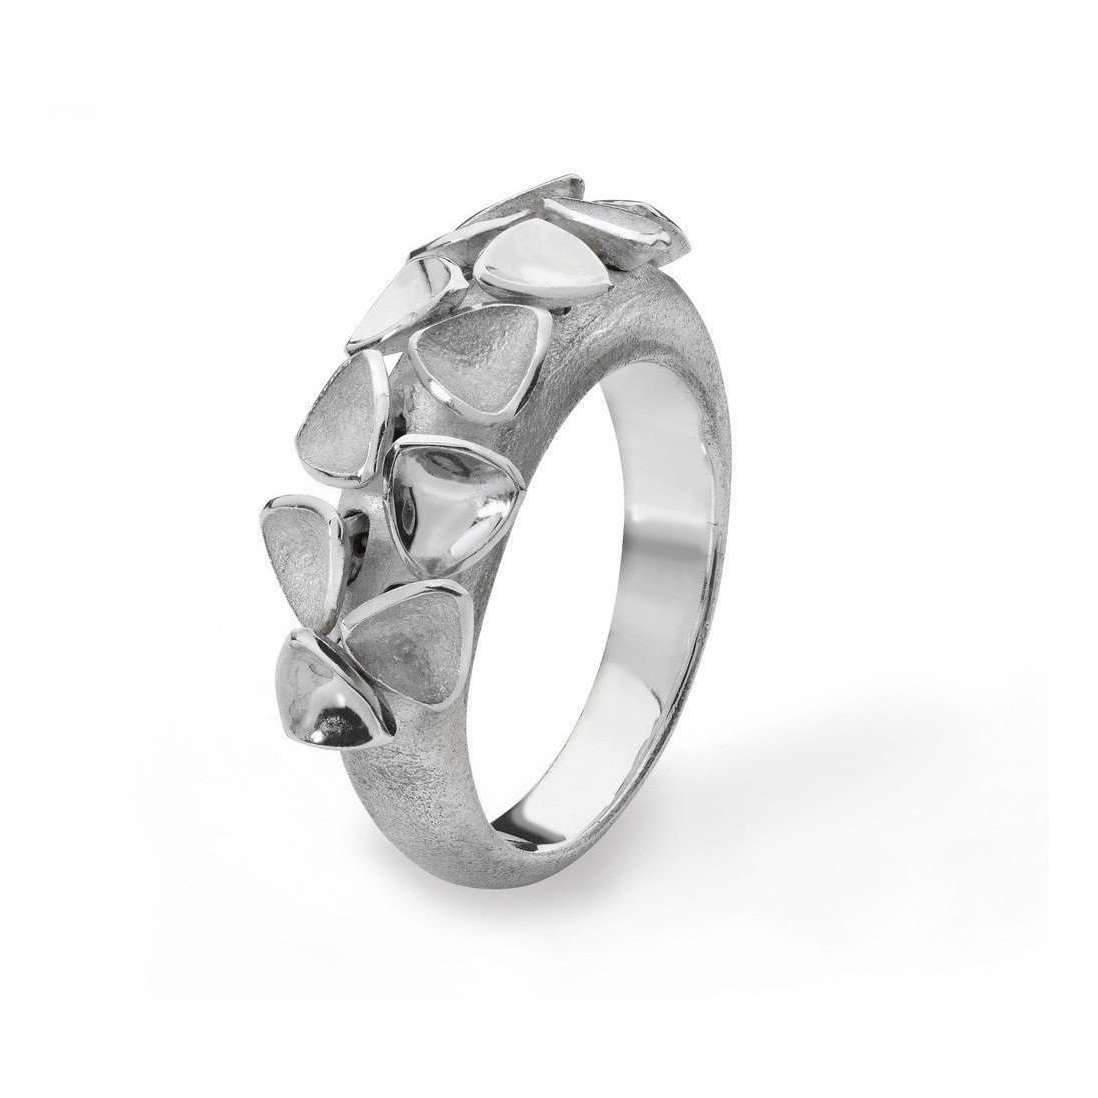 Amazona Secrets 18kt Gold Savannah Leaf Ring - UK N - US 6 1/2 - EU 54 K9eb2tA0e7